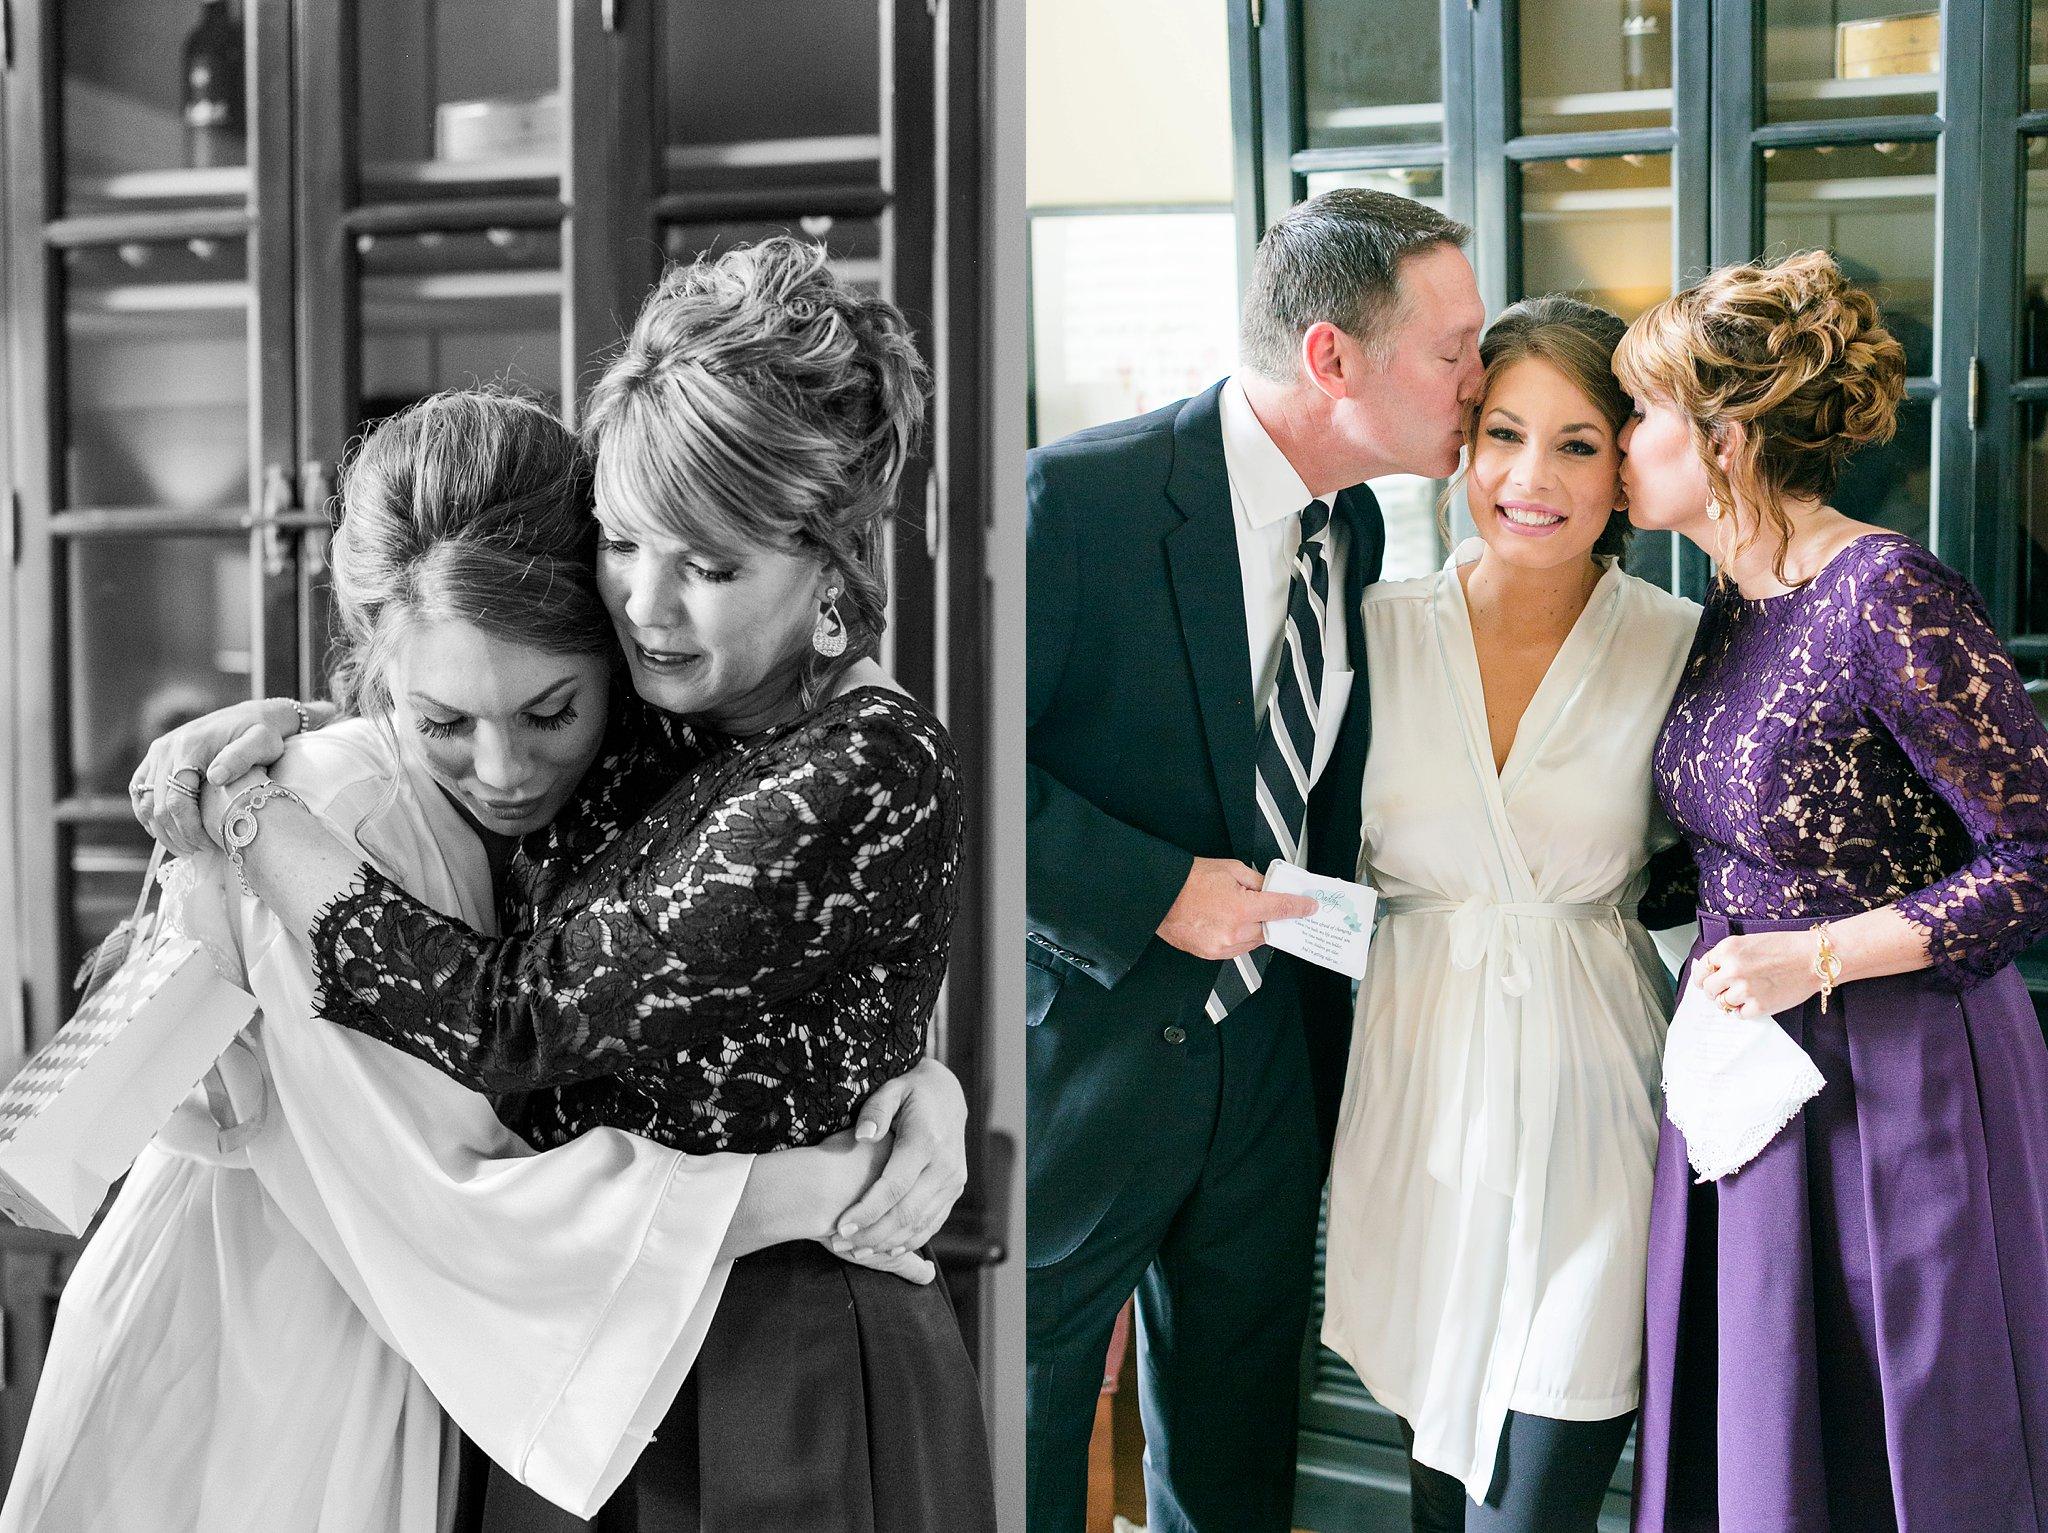 Stone Tower Winery Wedding Photos Virginia Wedding Photographer Megan Kelsey Photography Sam & Angela-33.jpg